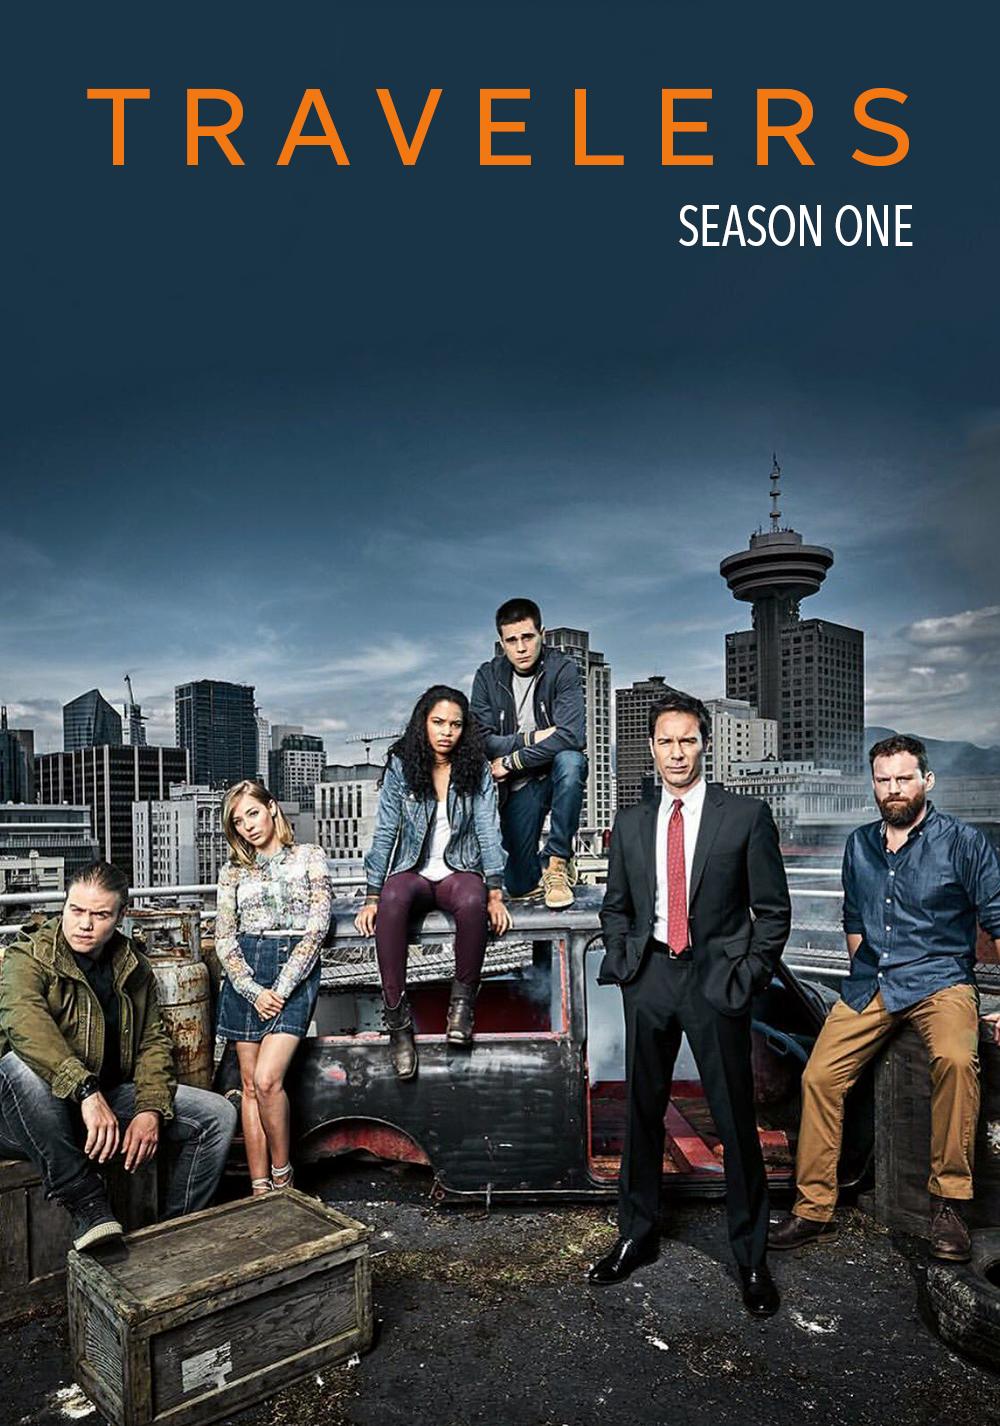 Travelers - Season 1 and 2 (New) - Mp4 x264 AC3 1080p